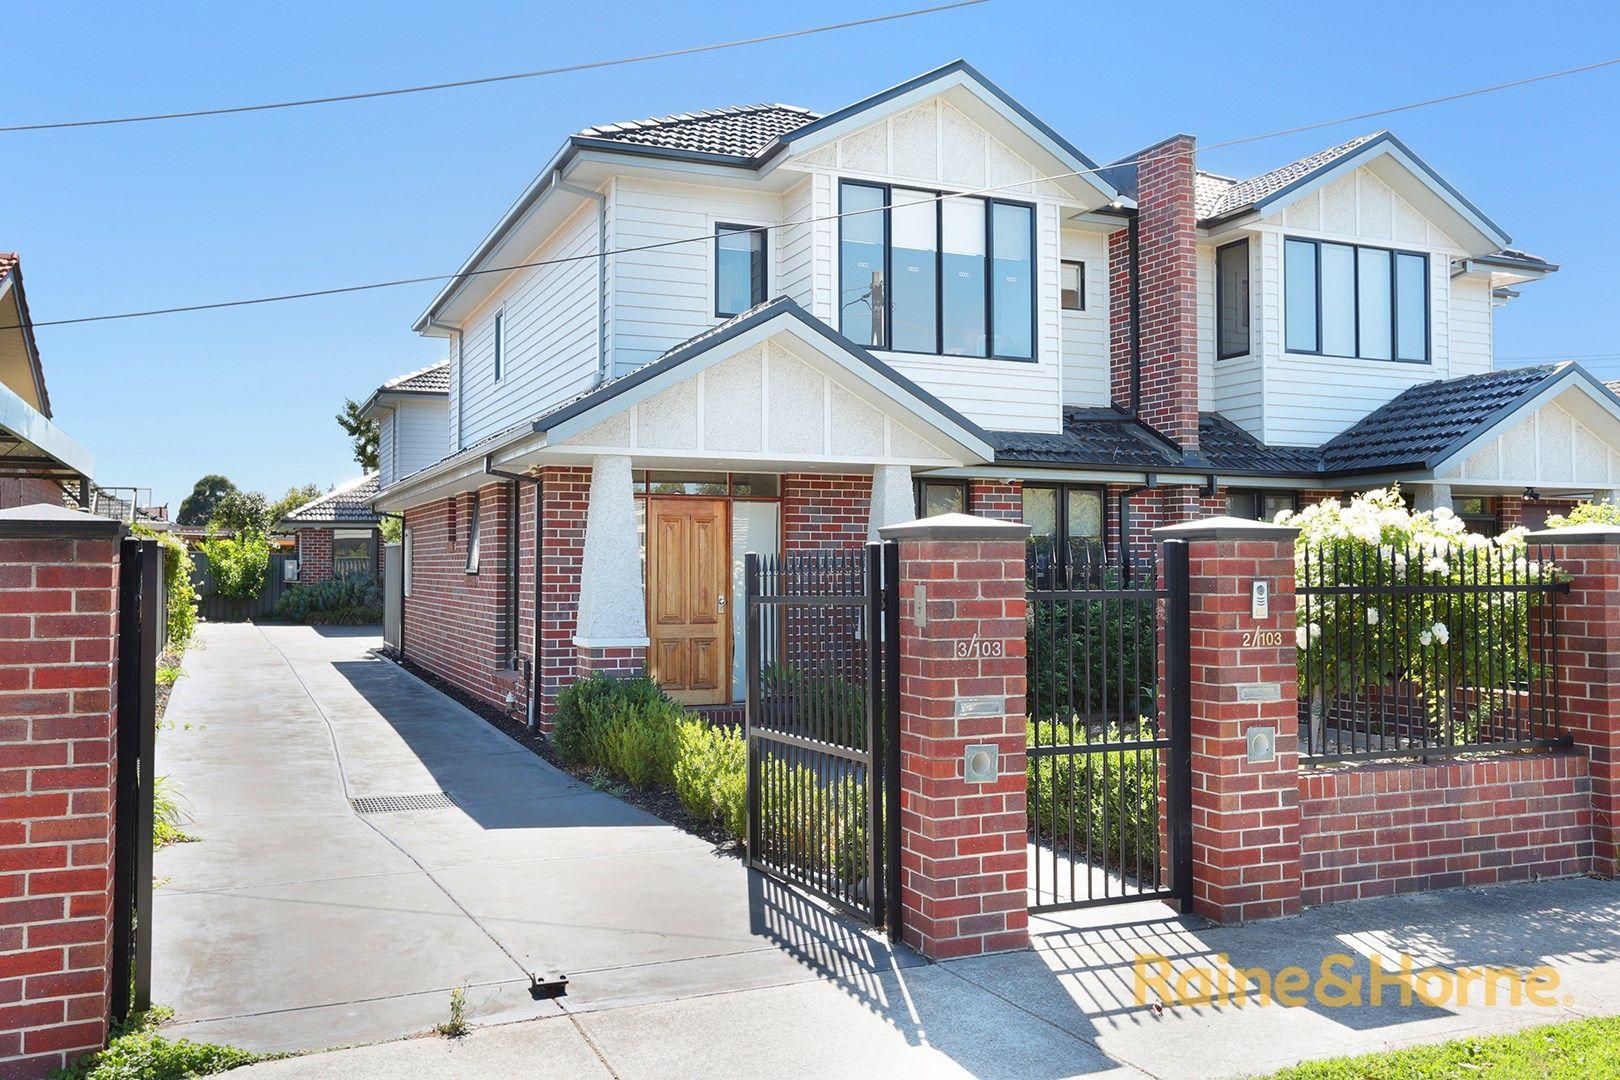 2/130 Rennie Street, Coburg VIC 3058, Image 0